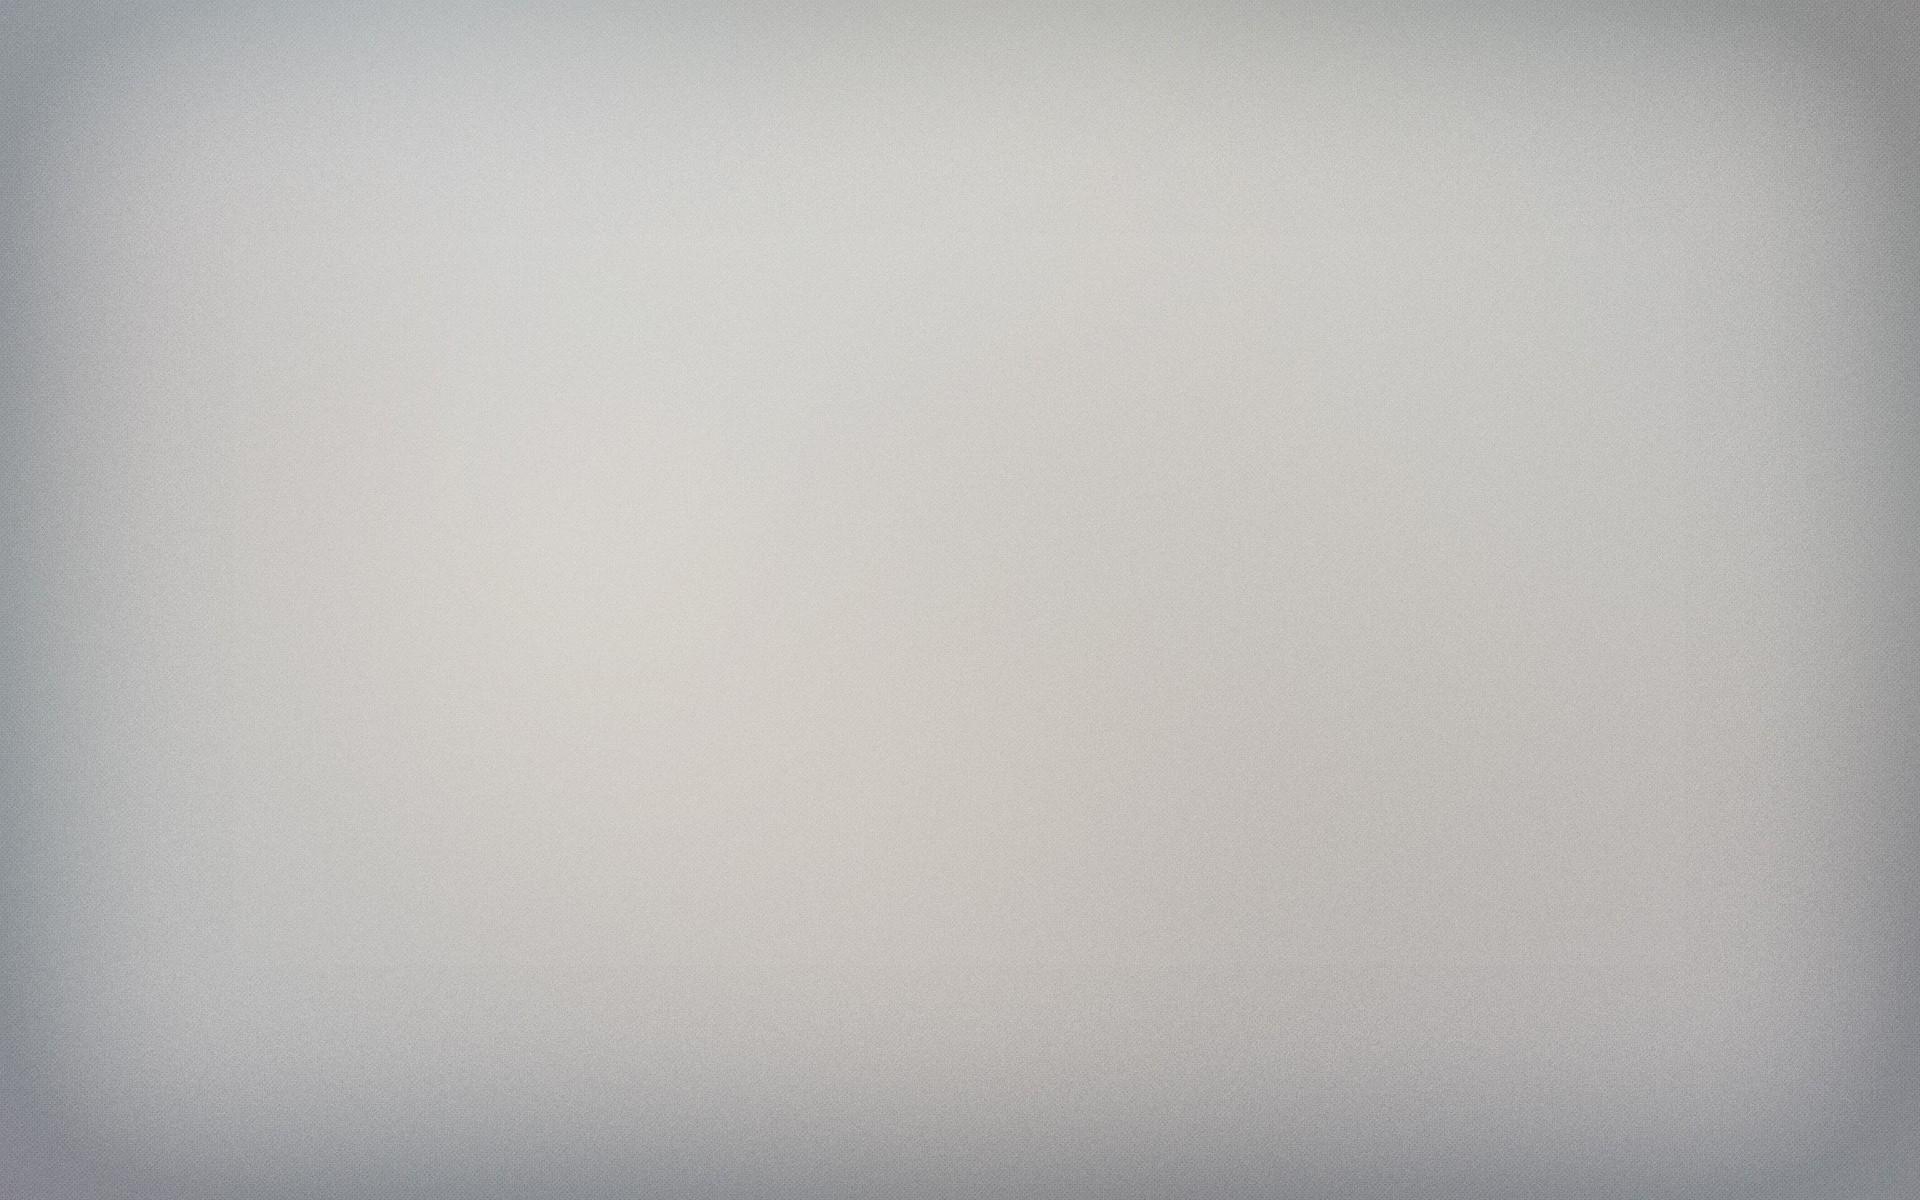 … Light Gray Wood And Light Gray S Light Grey Gradient Light Gray Wood  Background …